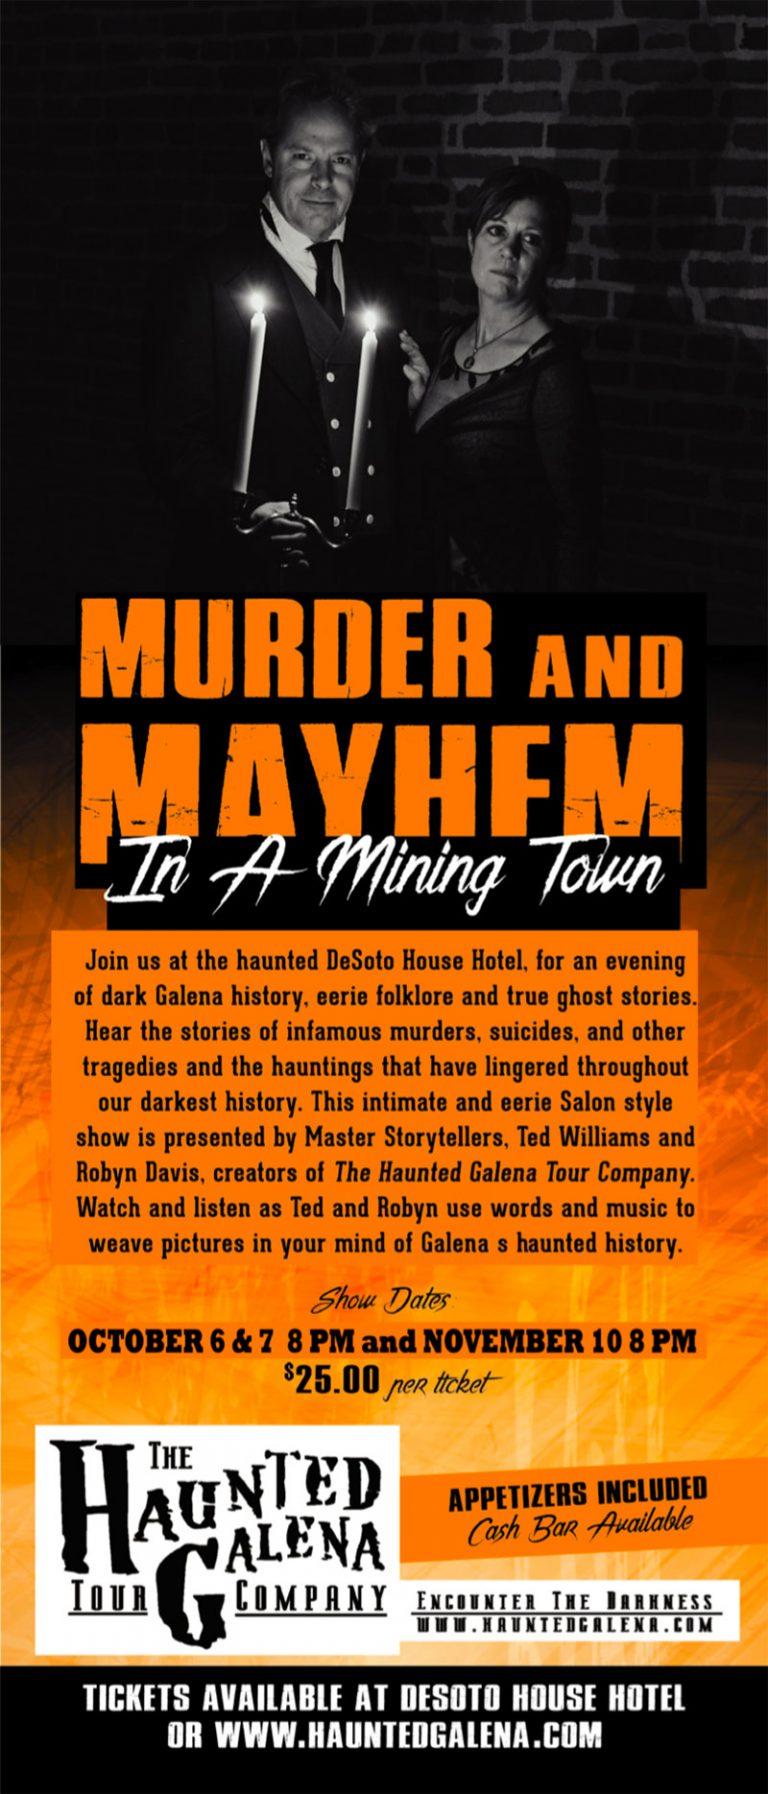 The Haunted Galena Tour Company